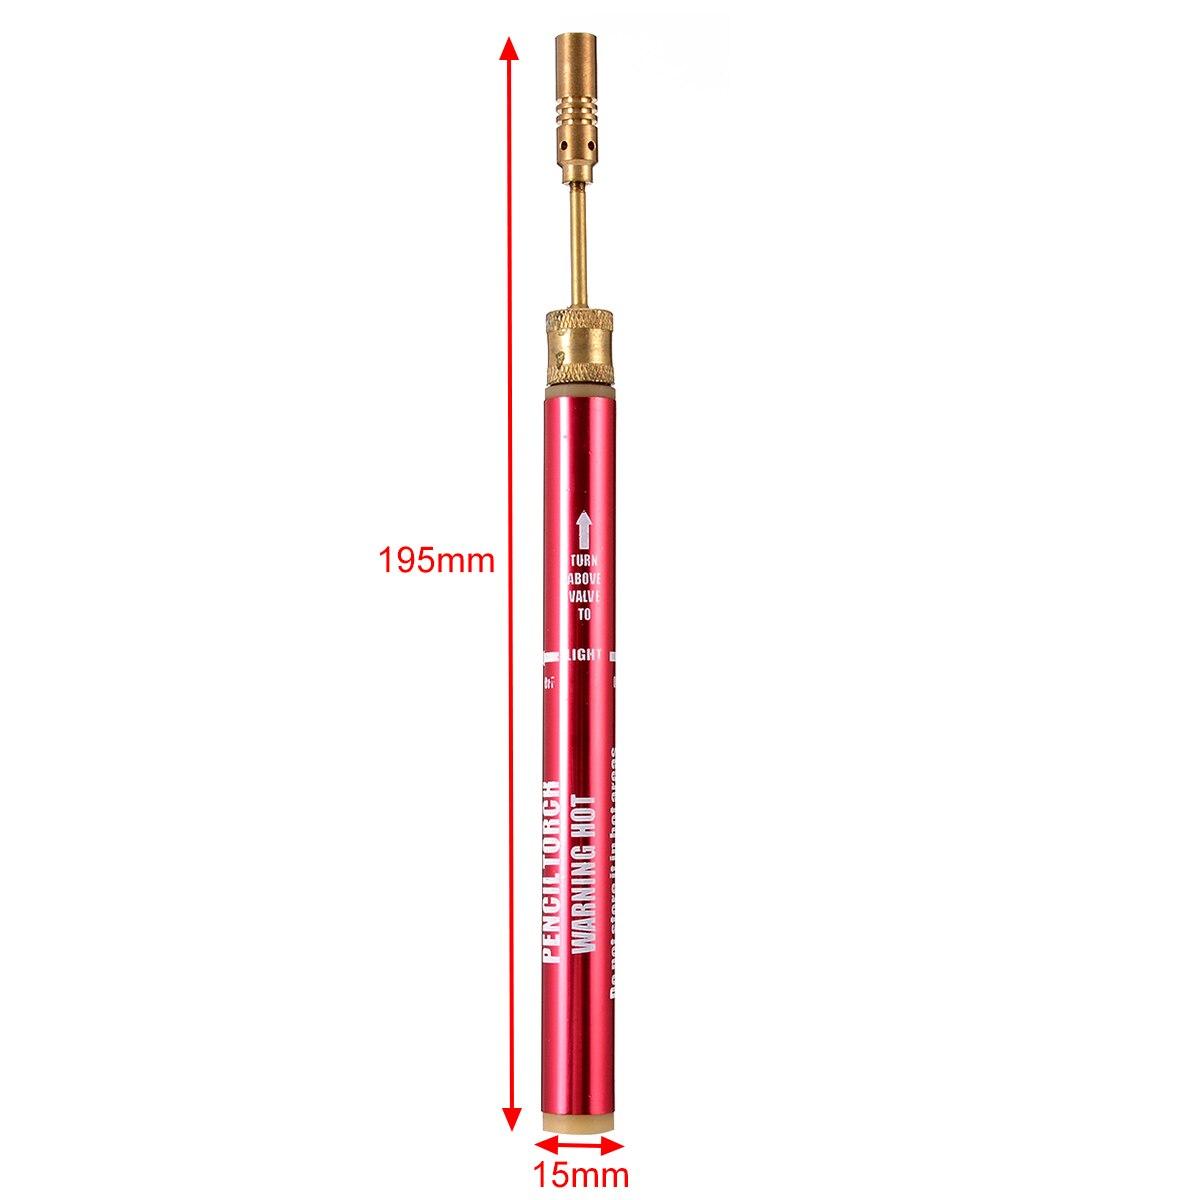 Mini Soldering Welding Iron Cordless Pen Burner Welding Torch Gun Pen Gas Blow Tool For Welding PVC Pipe Bending Tool